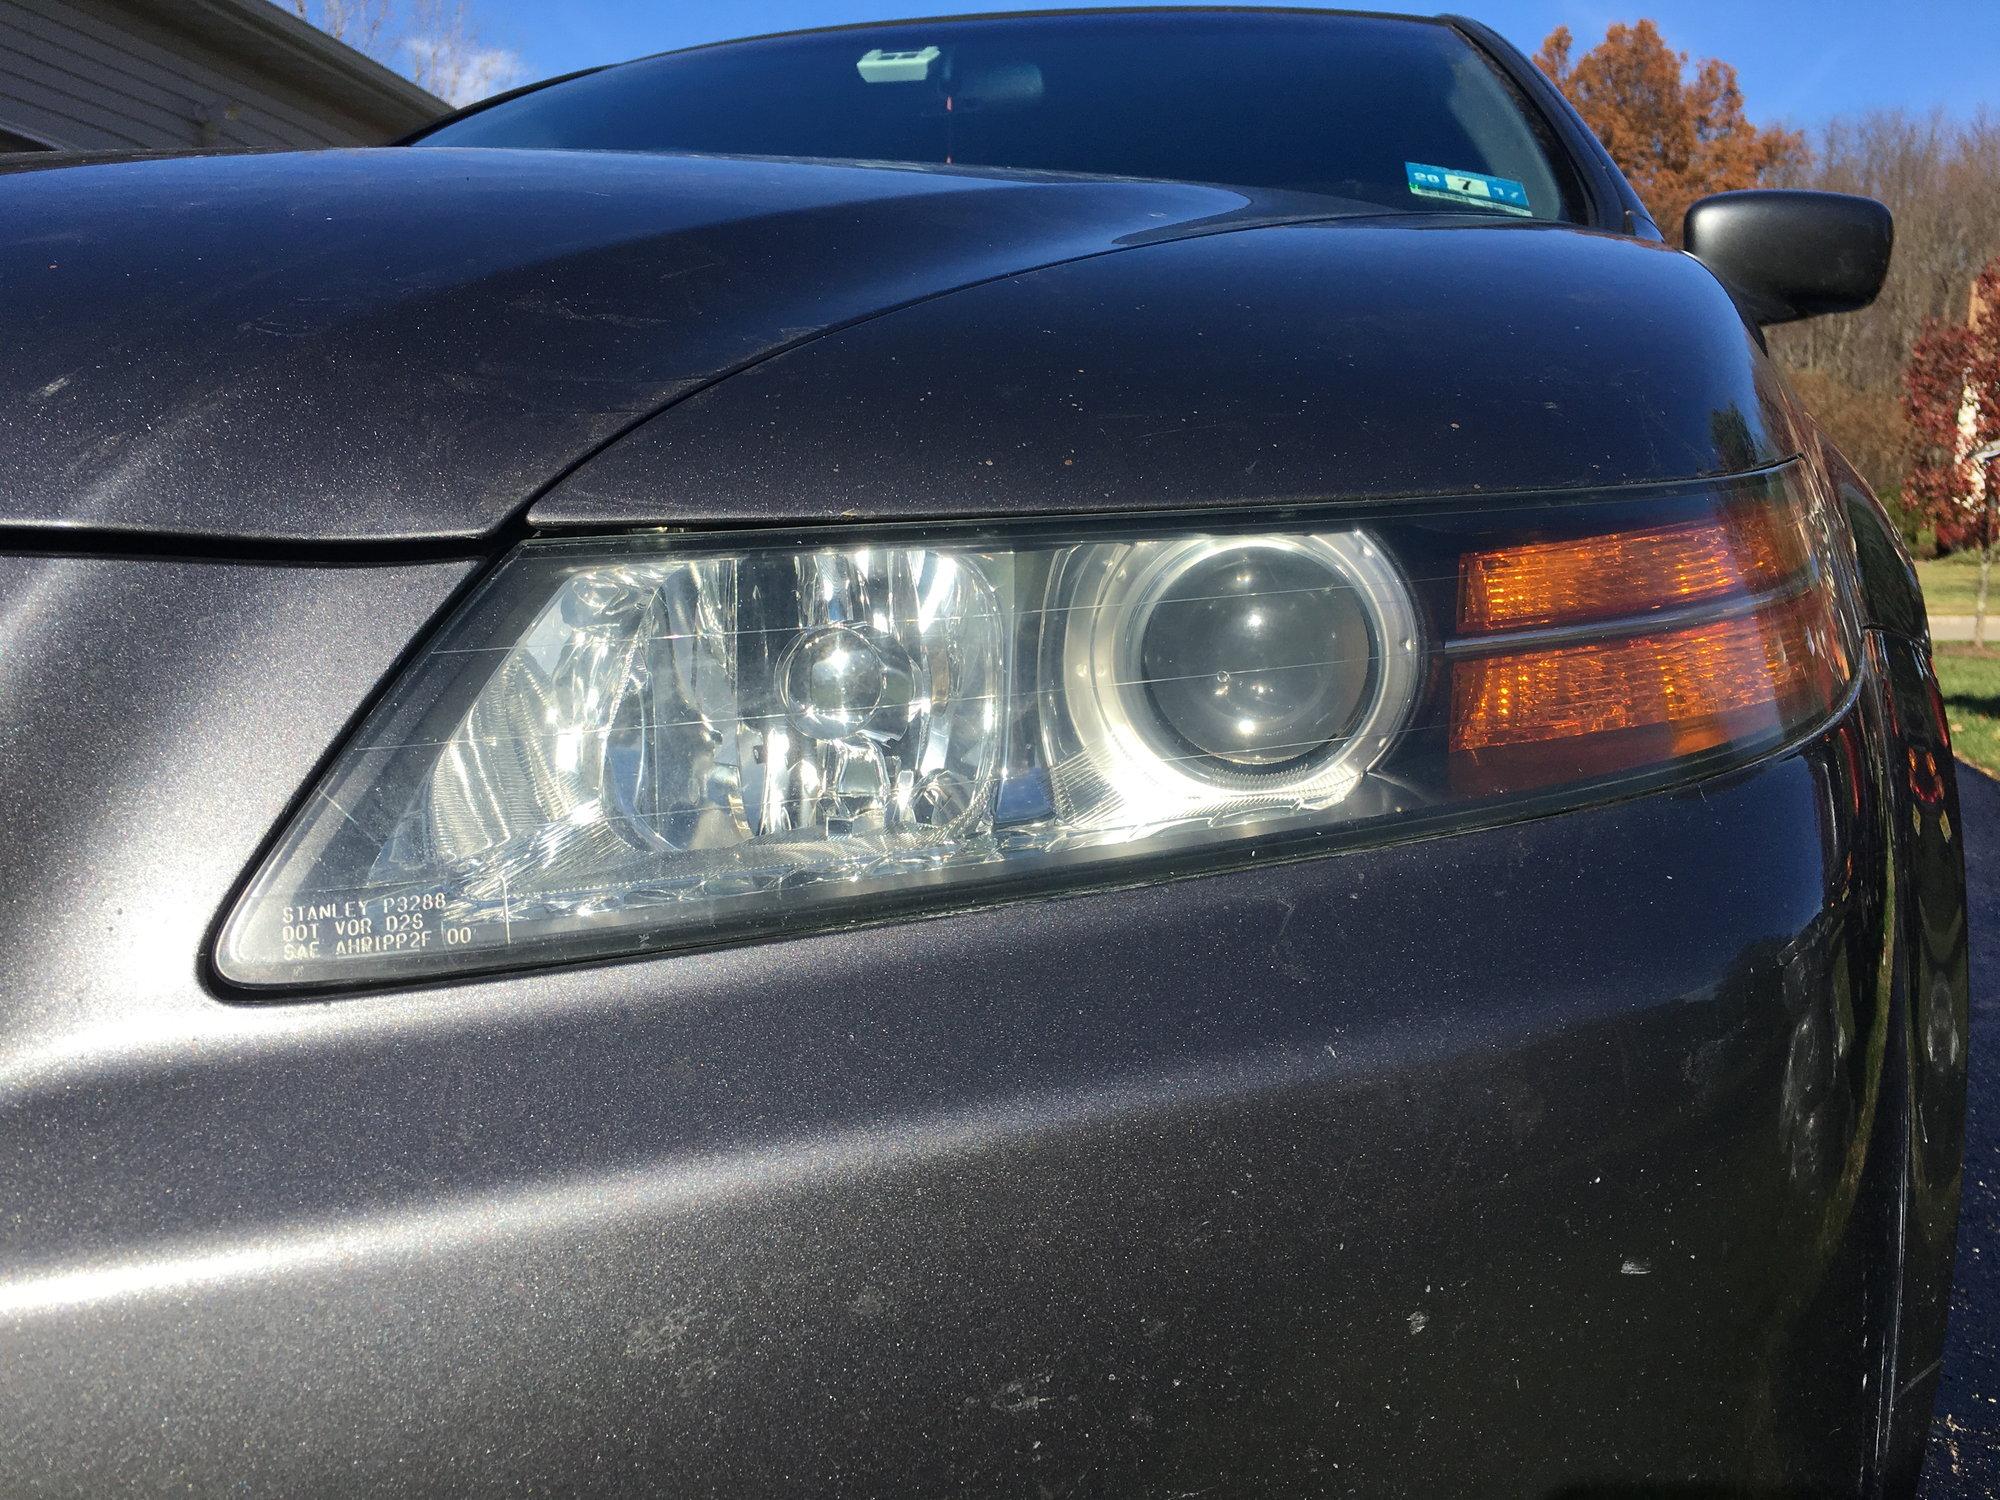 Super dim headlights - AcuraZine - Acura Enthusiast Community